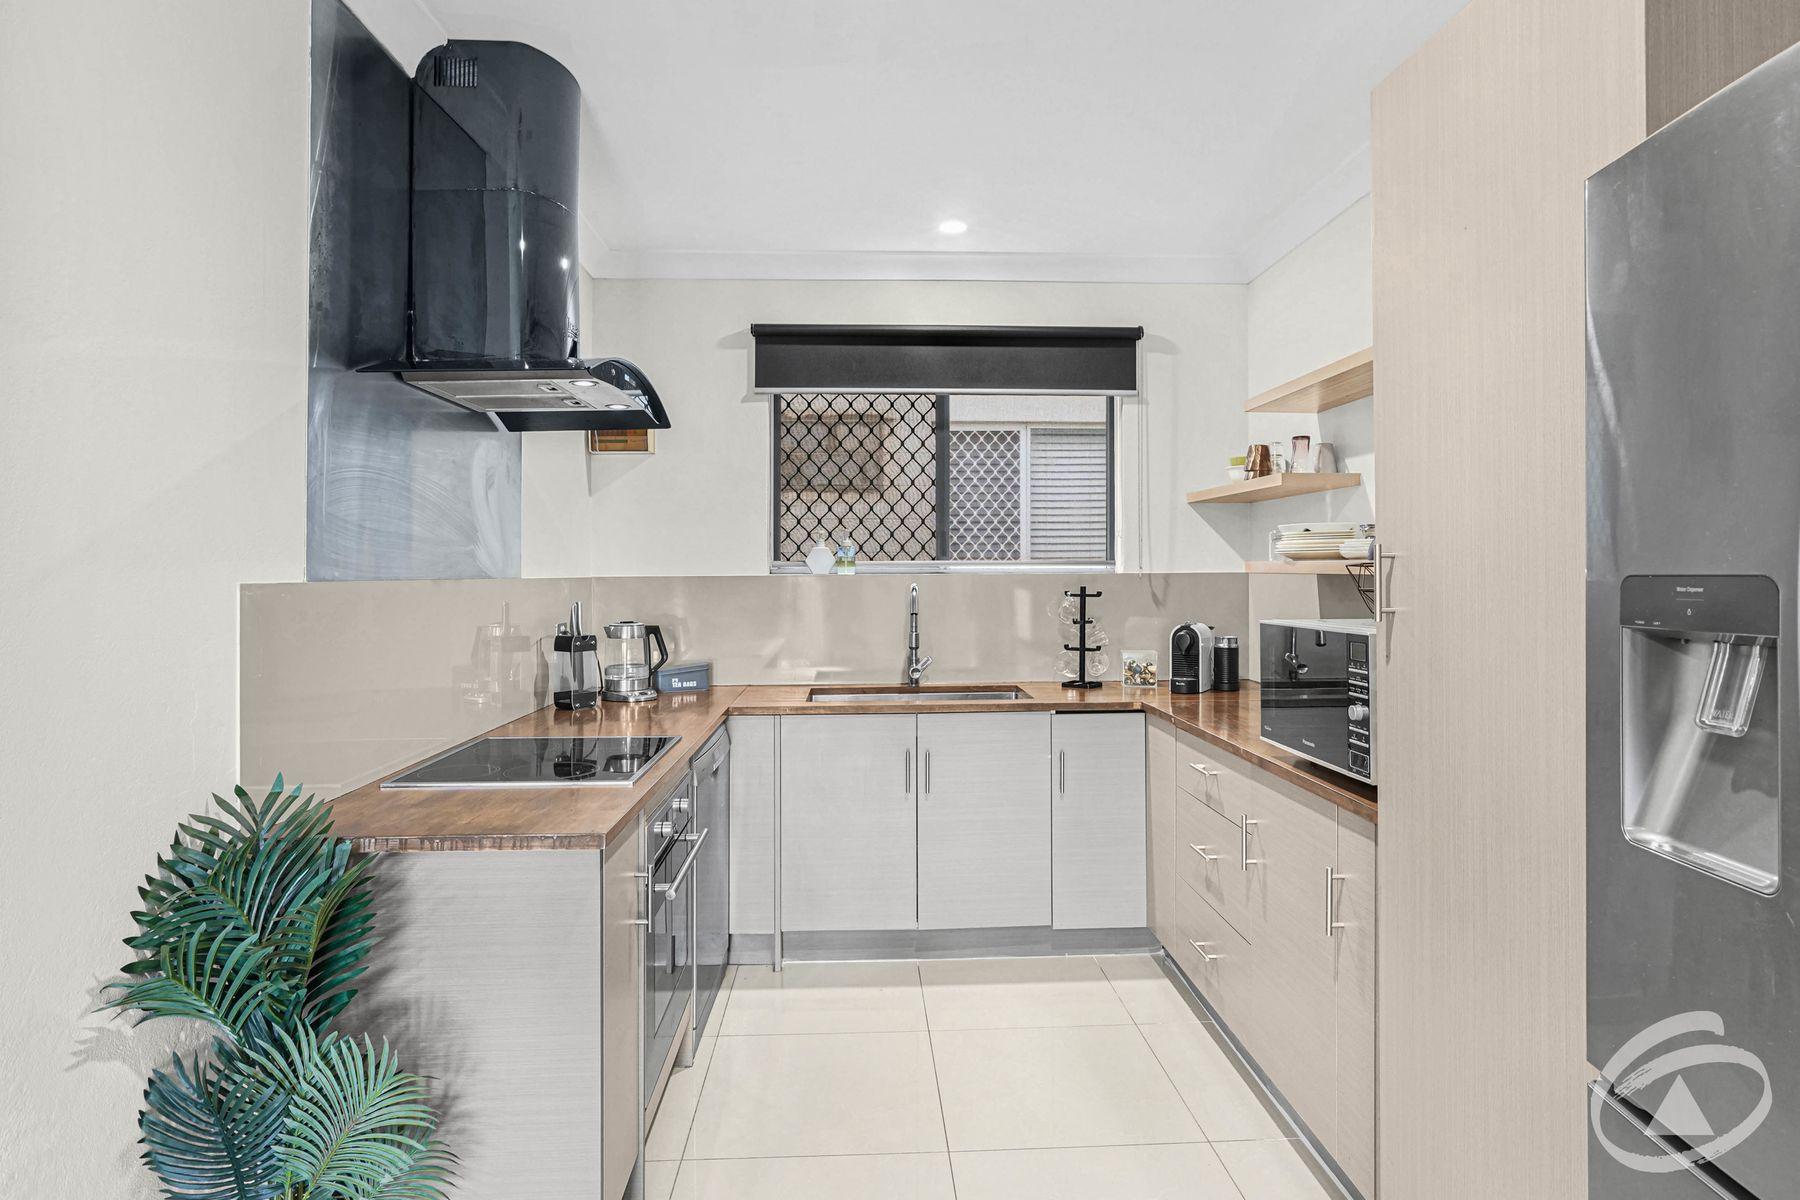 18/87-91 Earl Street, Westcourt, QLD 4870